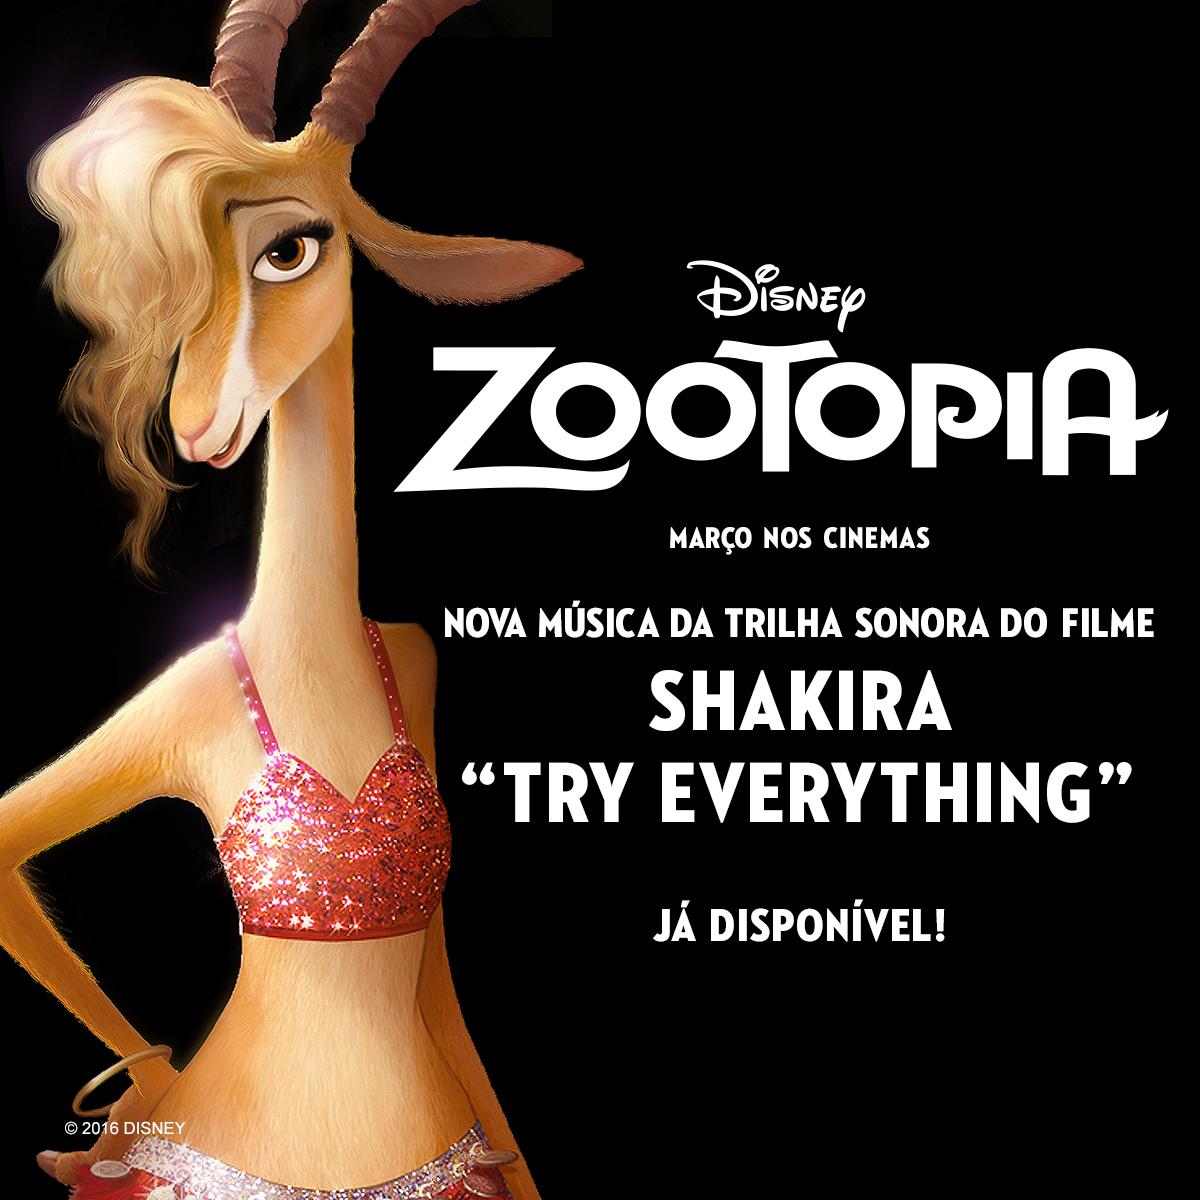 zootopia try everything shakira